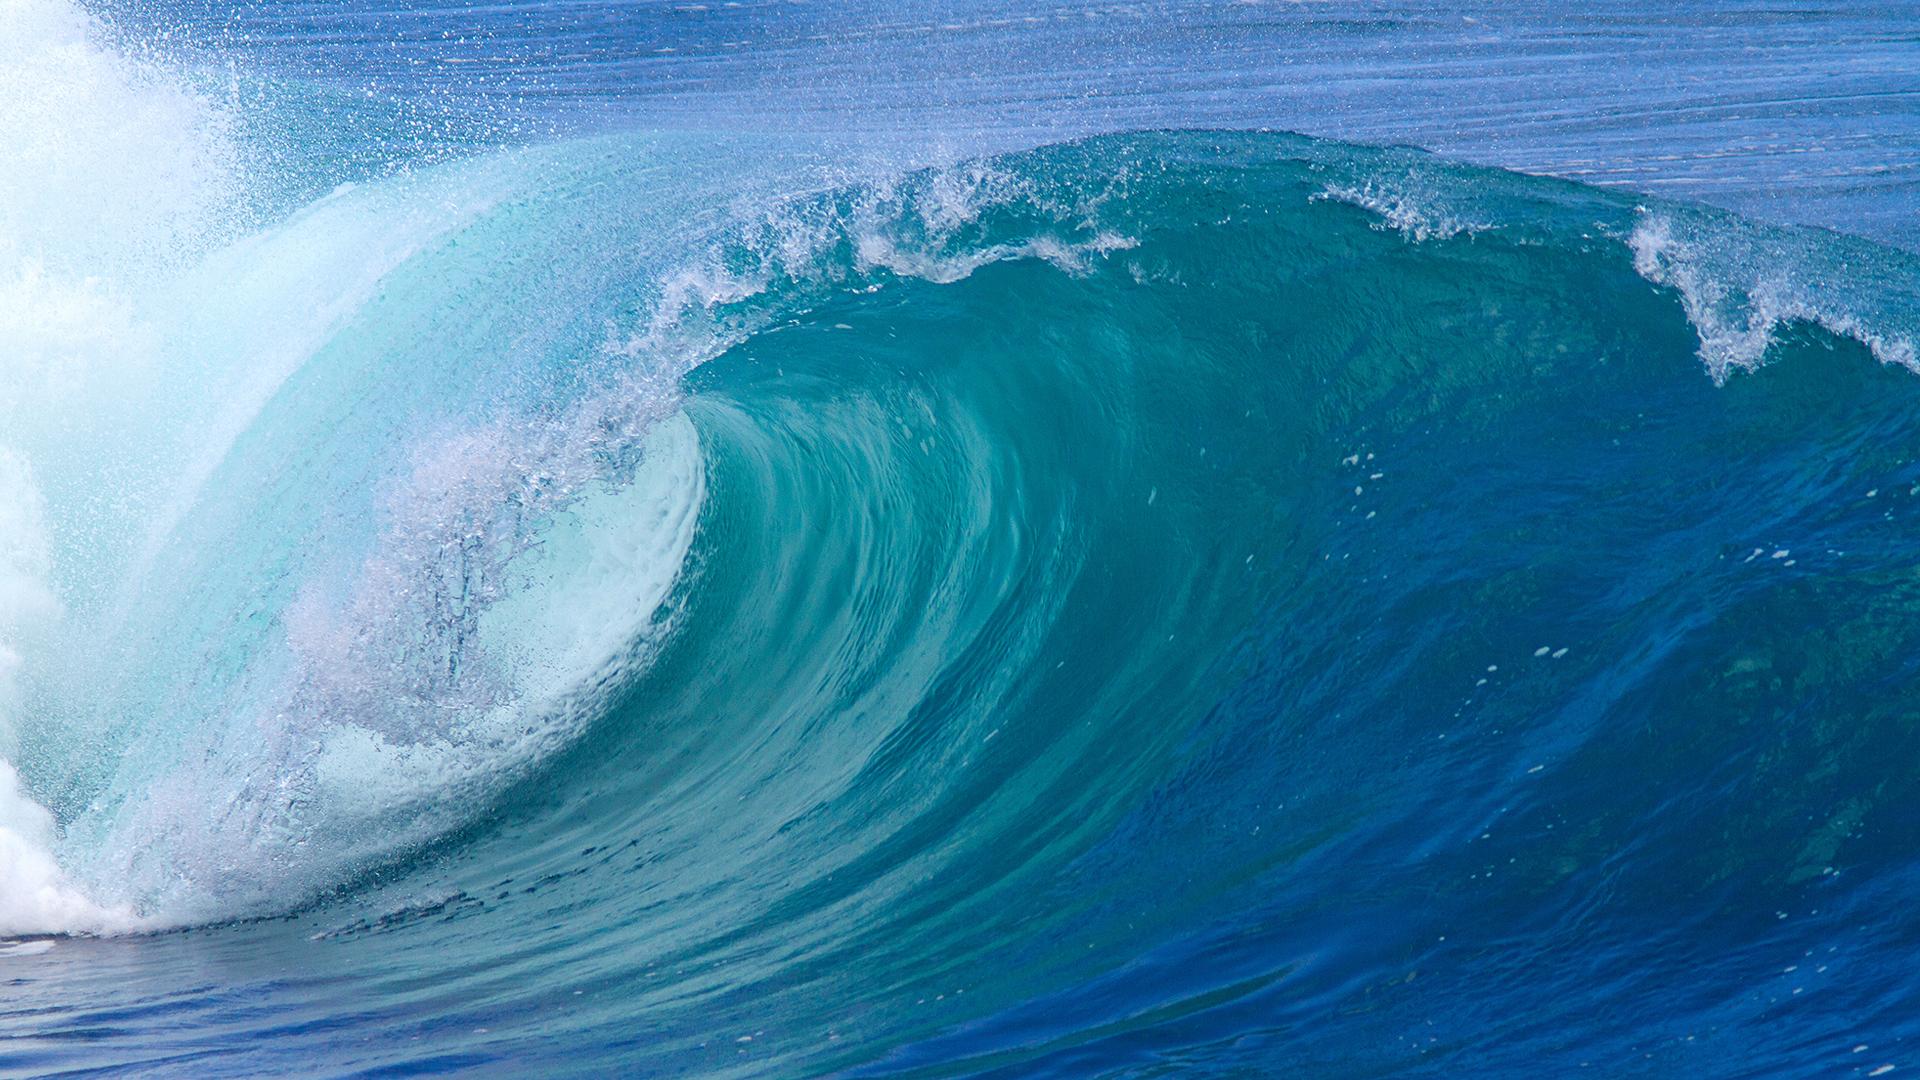 Wave 1920x1080px  2